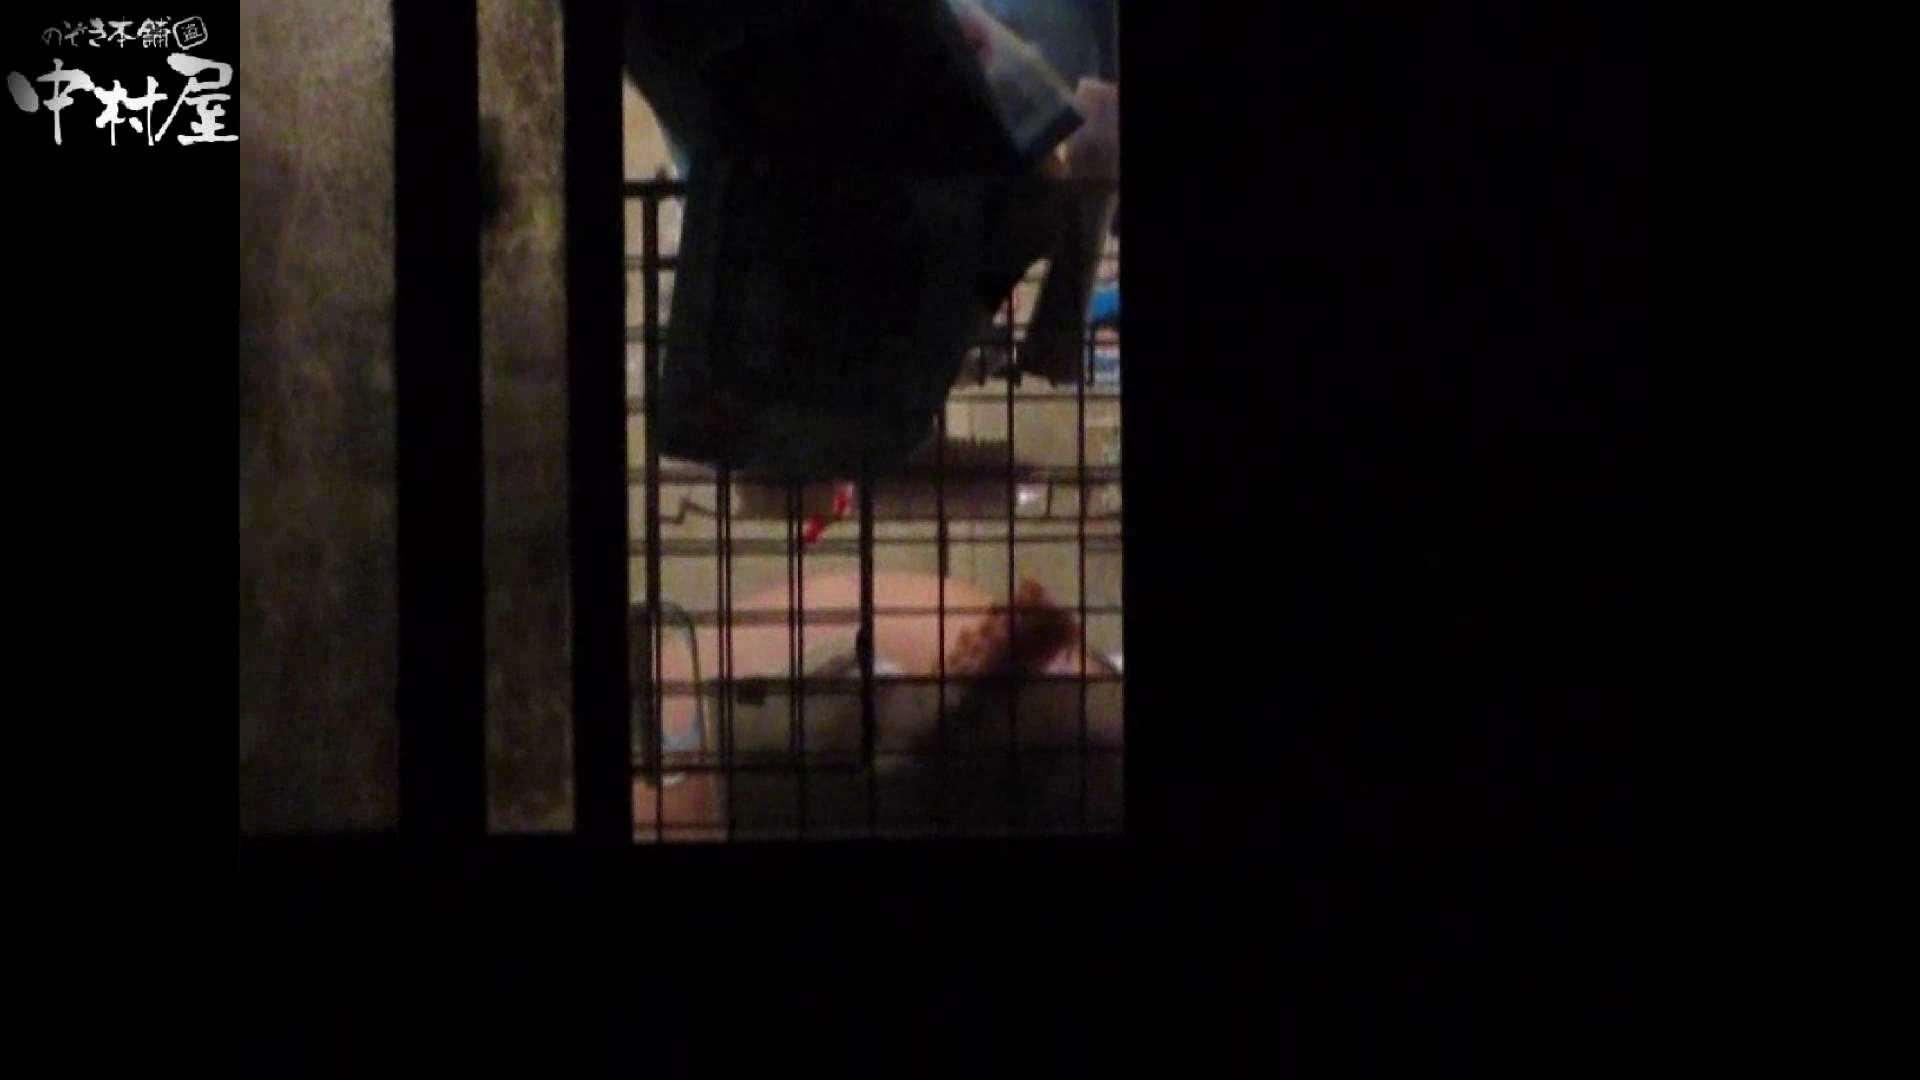 民家風呂専門盗撮師の超危険映像 vol.023 OLのエロ生活 性交動画流出 95連発 74